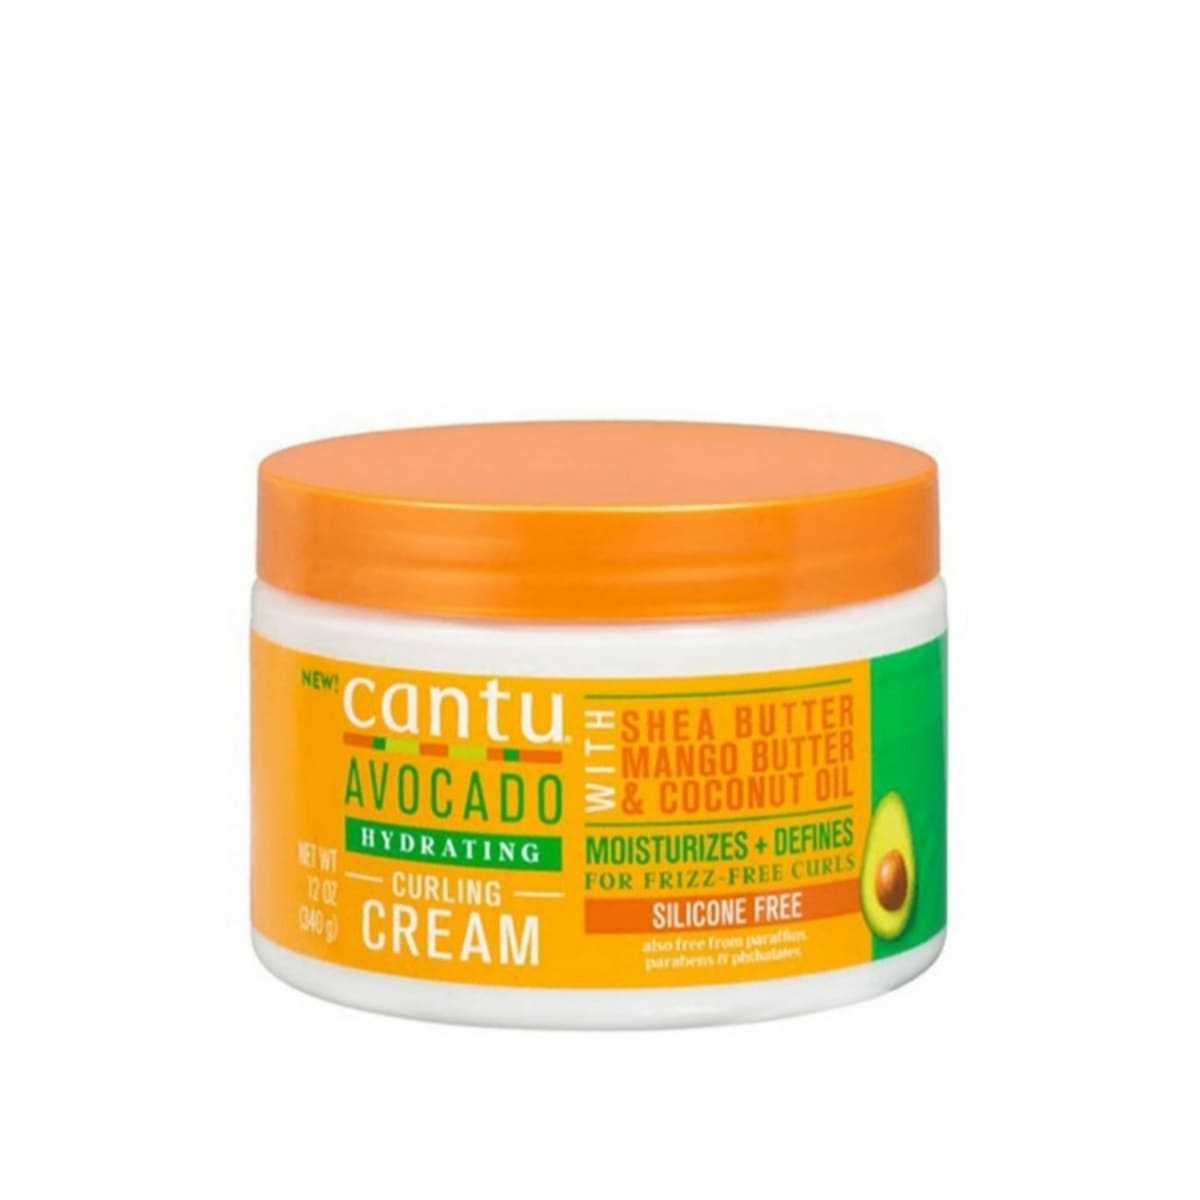 comprar-cosmetico-vegano-definidor-crema-shea-butter-mango-butter-&-coconut-oil-moisturizes-defines-cantu-metodo-curly-trenzas-crochet-pelucas-www.muerebella.com